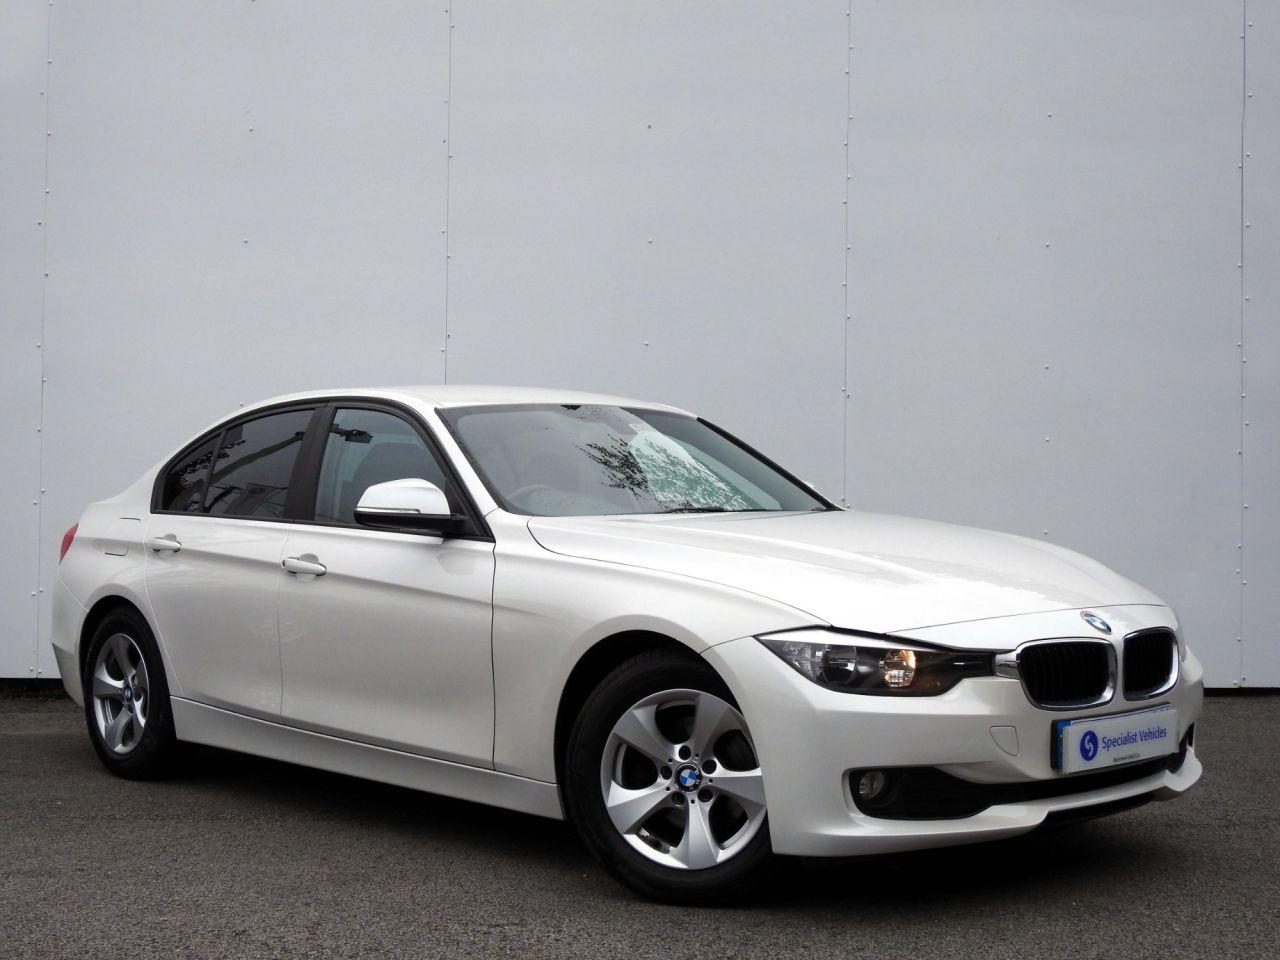 USED 2012 62 BMW 3 SERIES 2.0 320D EFFICIENTDYNAMICS 4d 161 BHP FULL BMW  MAIN DEALER ...